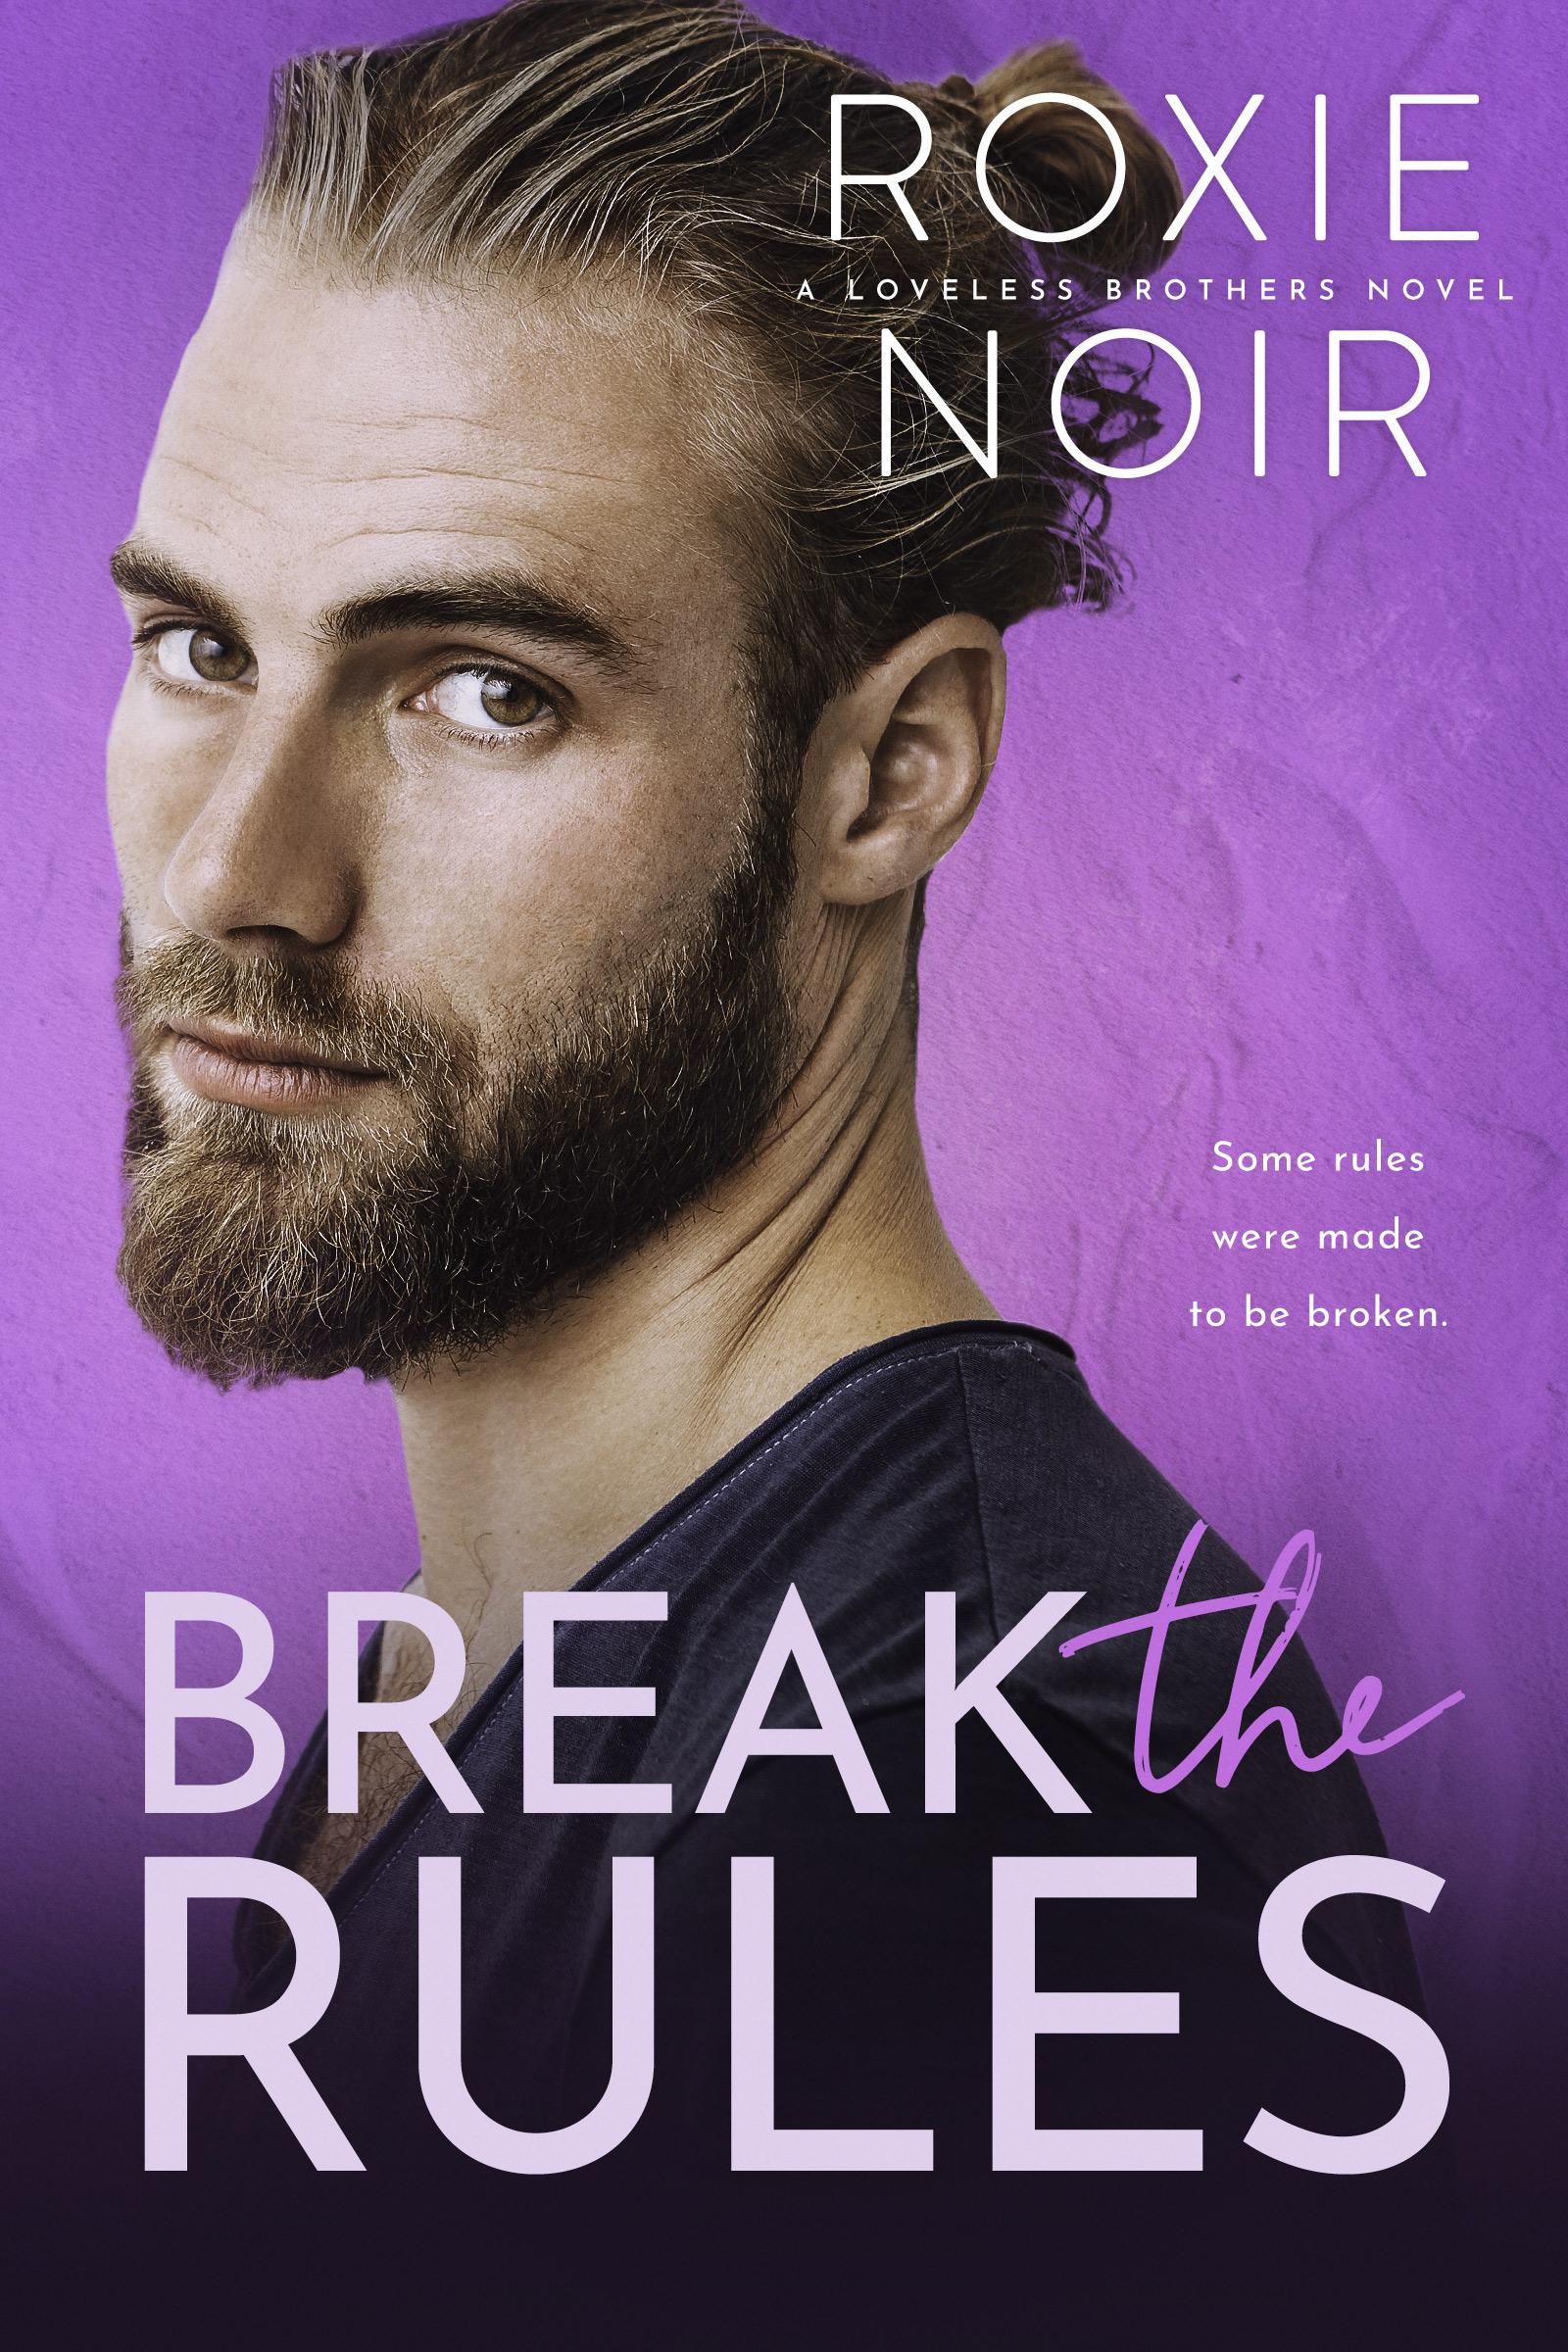 RN_BreaktheRules_Ebook